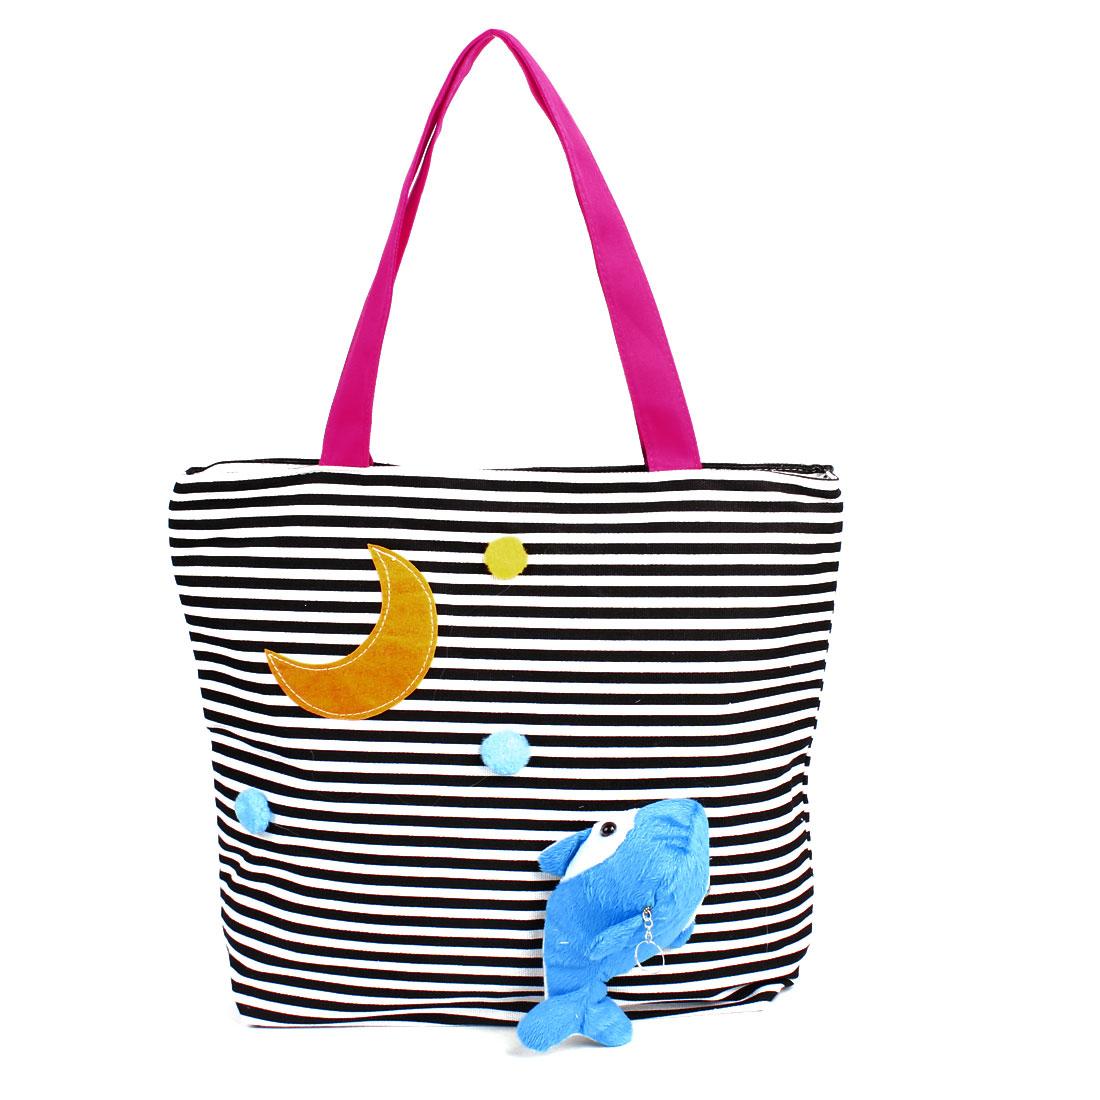 Lady Horizonal Strip Print Nylon Lining Zip Up Shopping Handbag Bag Black White